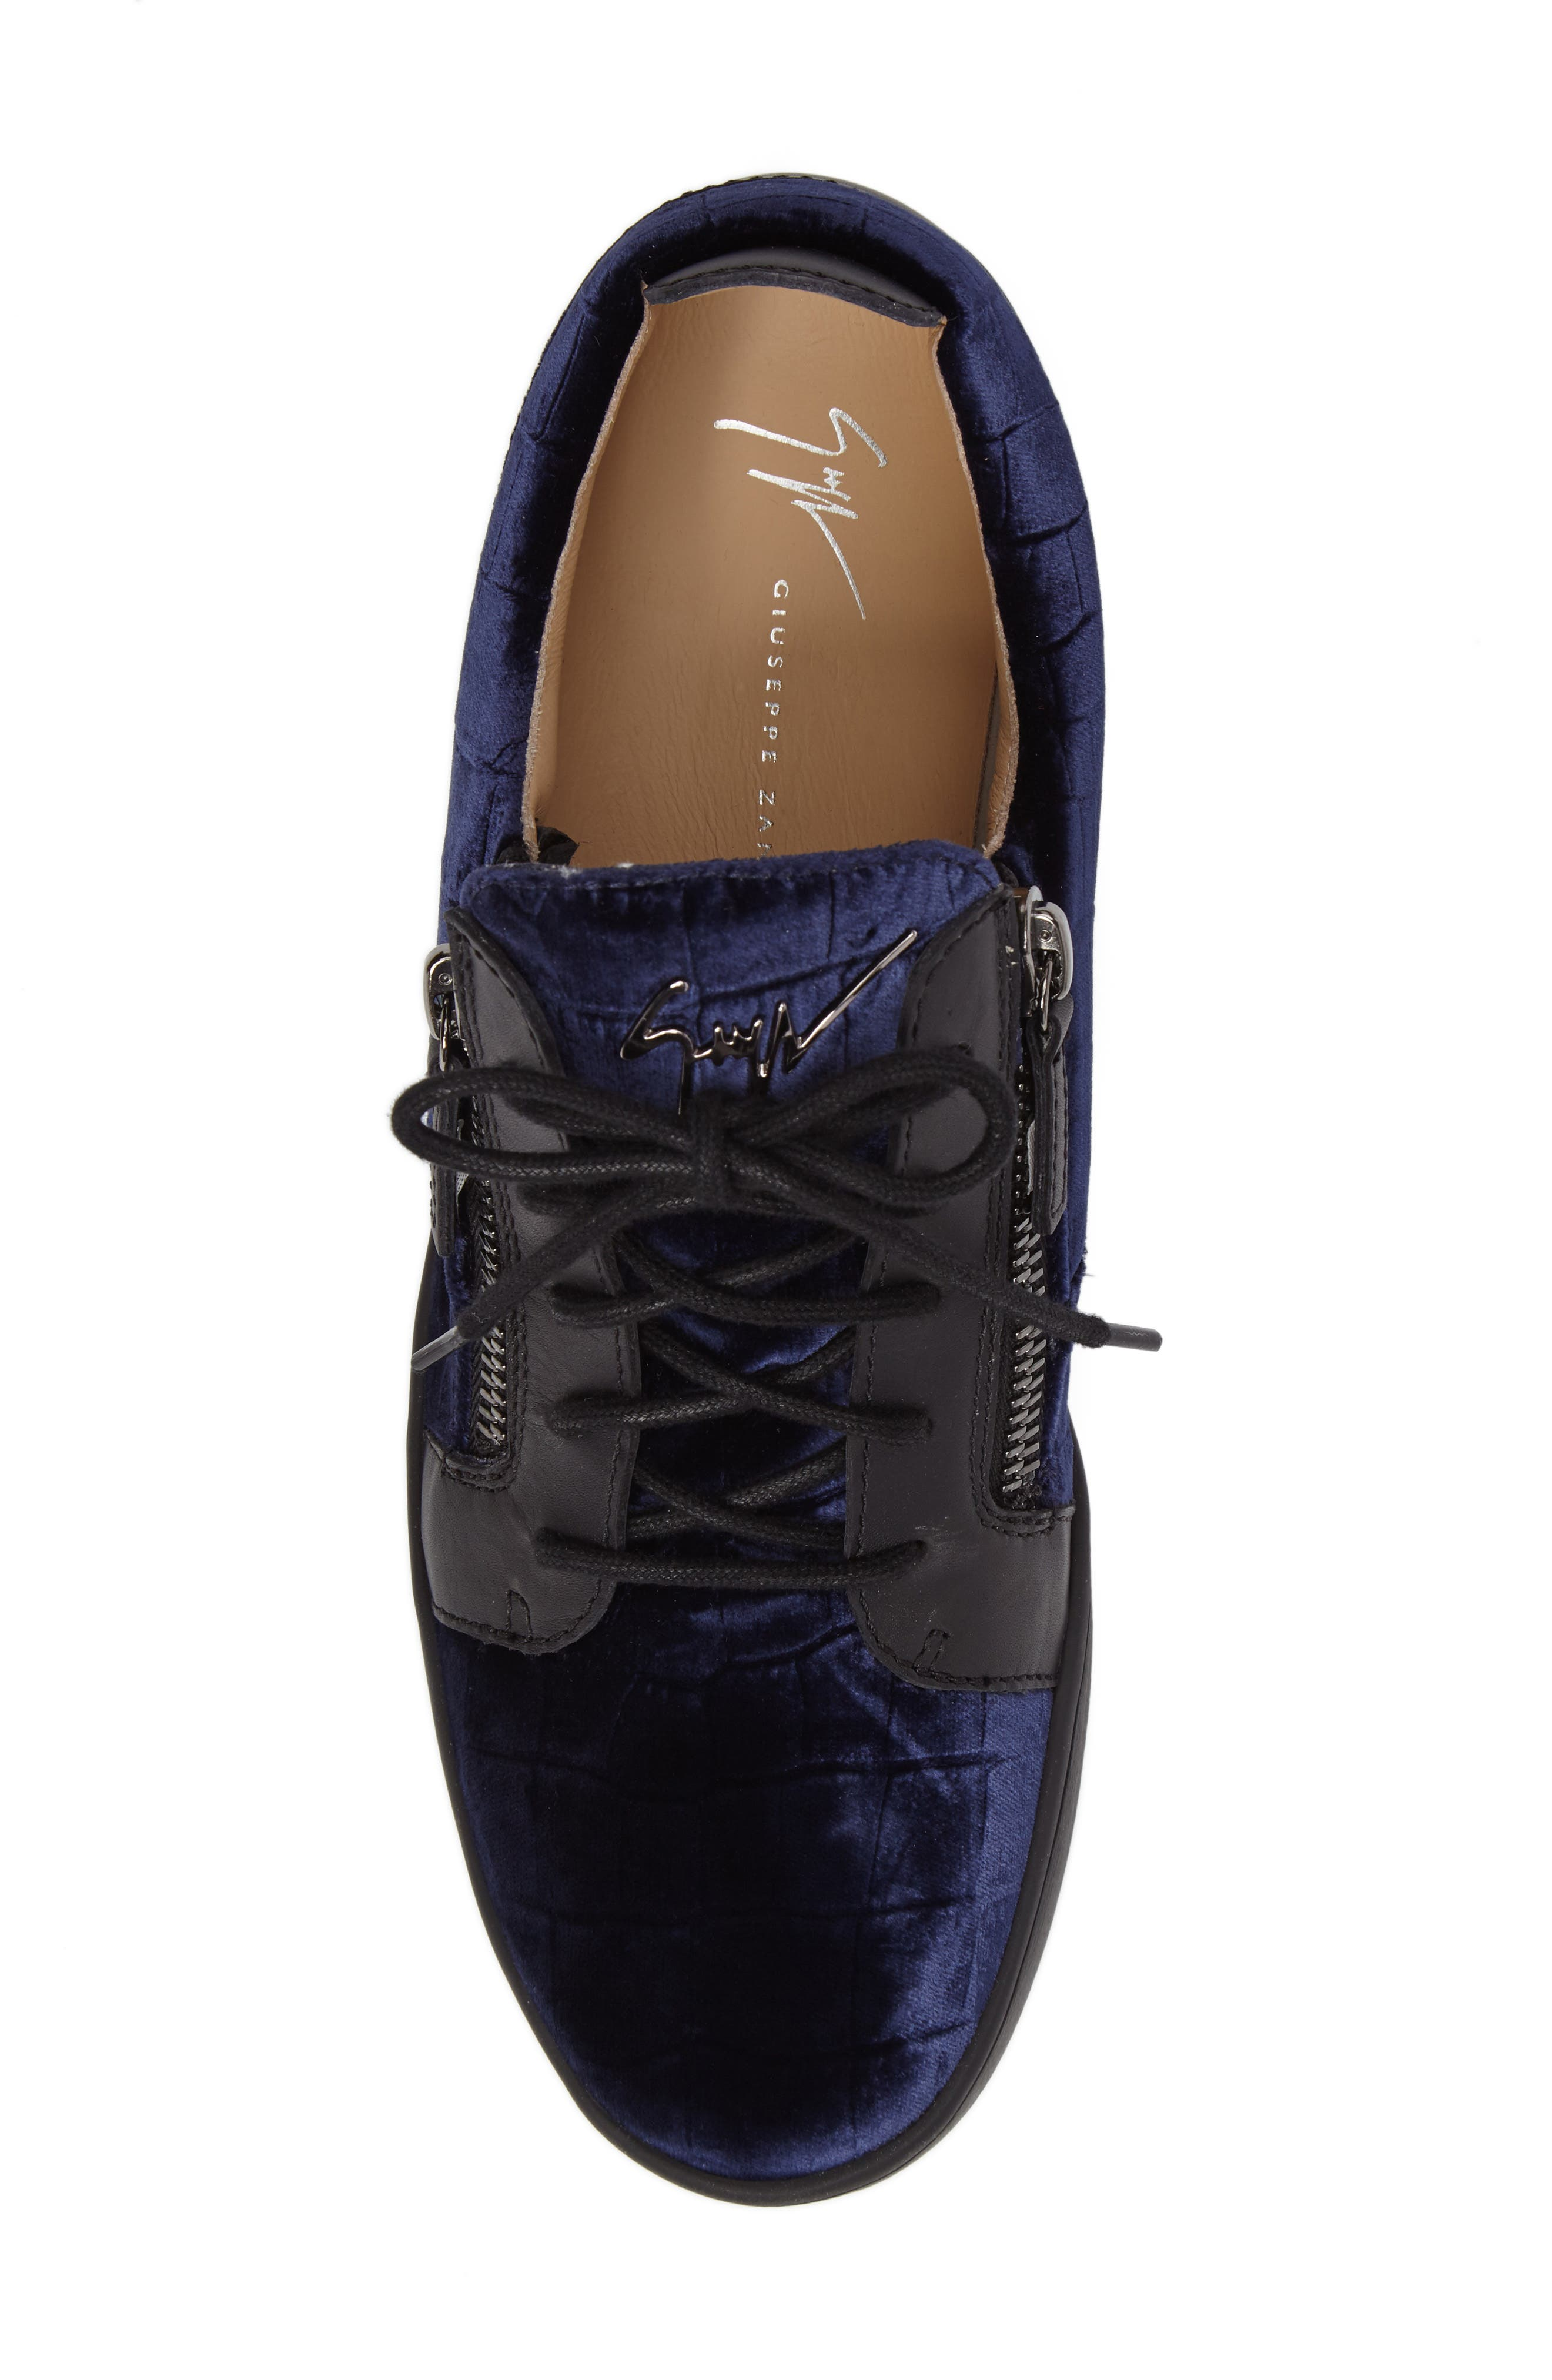 Low Top Sneaker,                             Alternate thumbnail 5, color,                             Navy